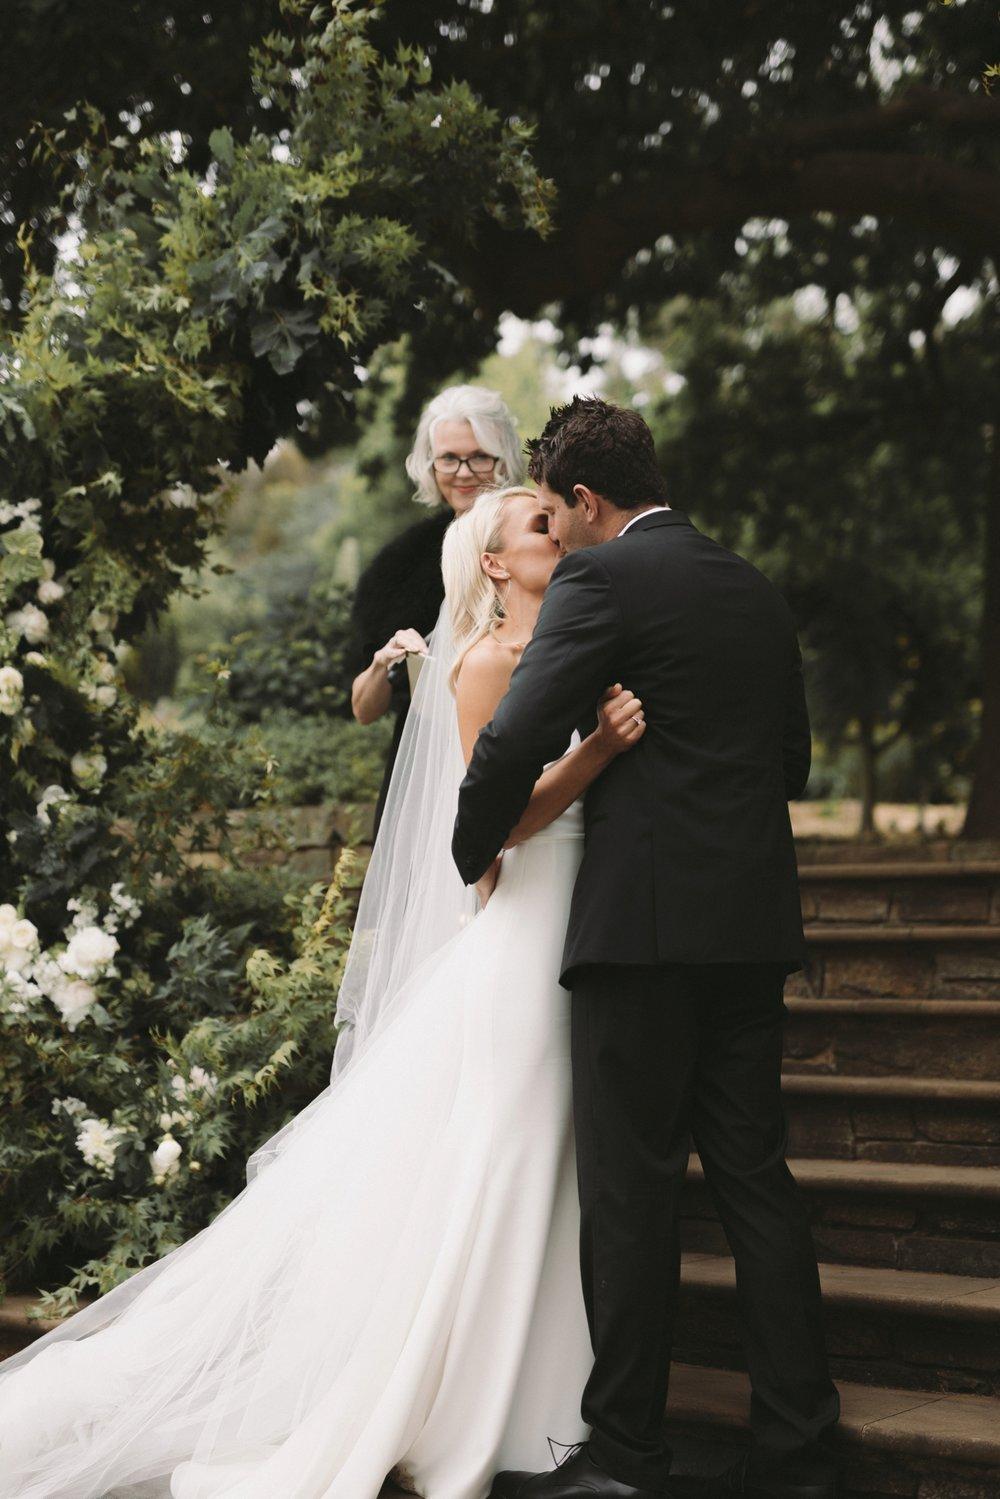 Rebecca & Daniel - Adelaide Hills Private Property Wedding Photographer - Fine Art Wedding Photographer Australia - Katherine Schultz - www.katherineschultzphotography.com_0038.jpg